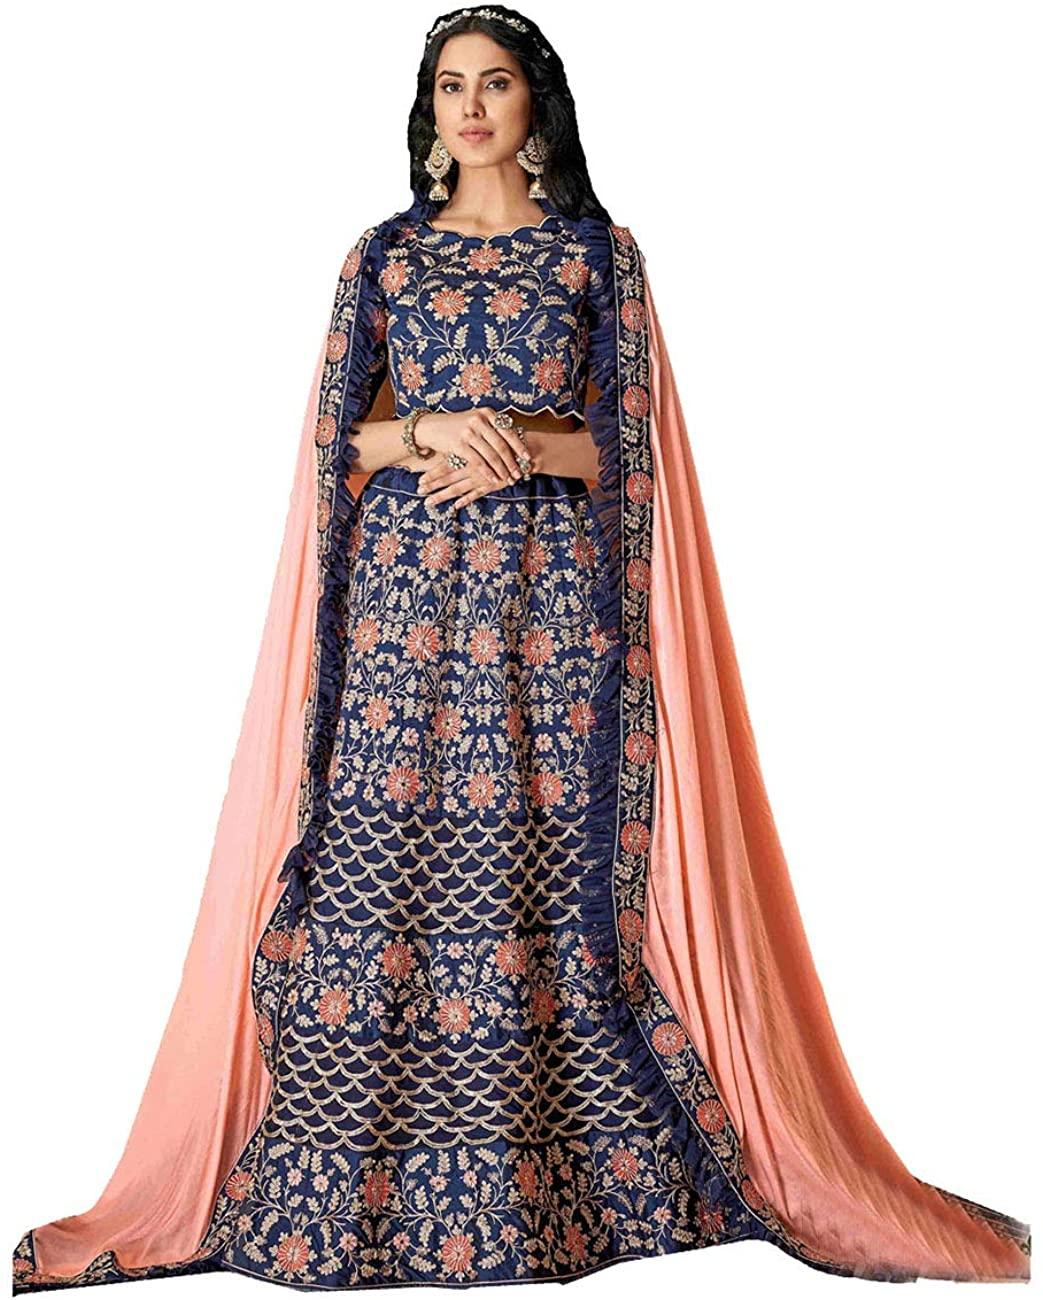 Indian Women Designer Partywear Ethnic Traditional Blue Lehenga Choli. ICW2607-4